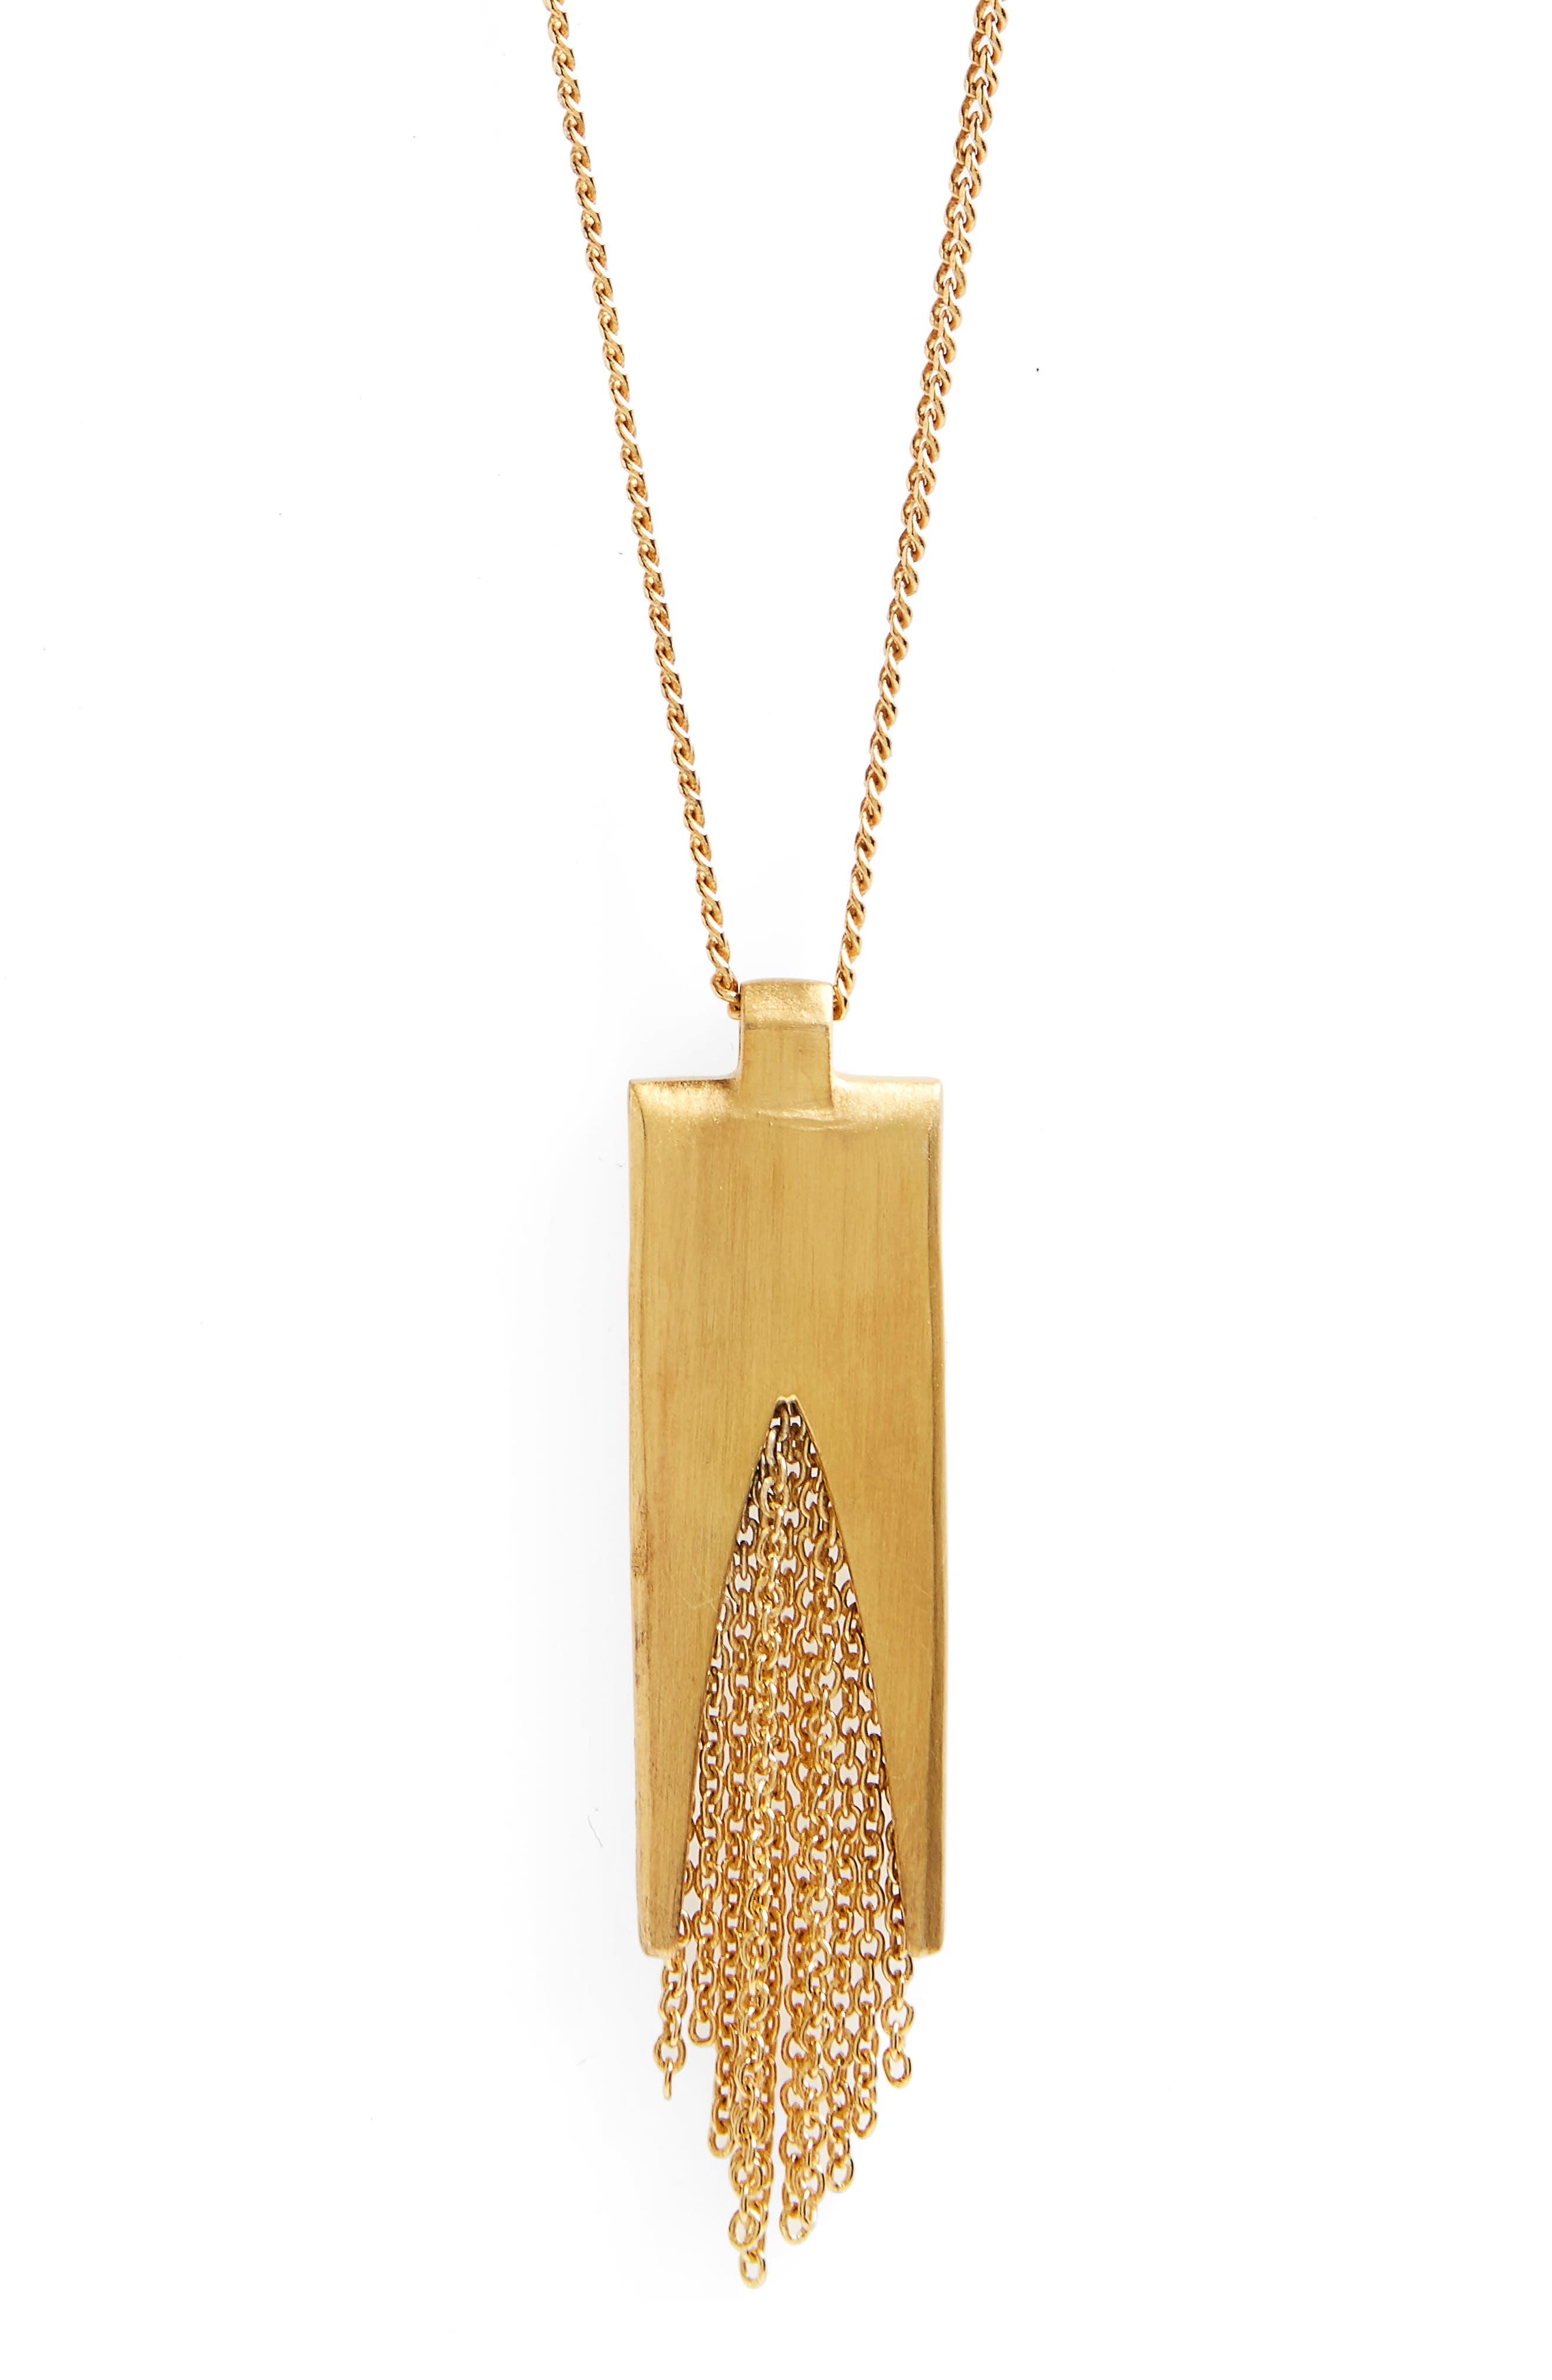 Alternate Image 1 Selected - Dean Davidson Cloak Chain Pendant Necklace